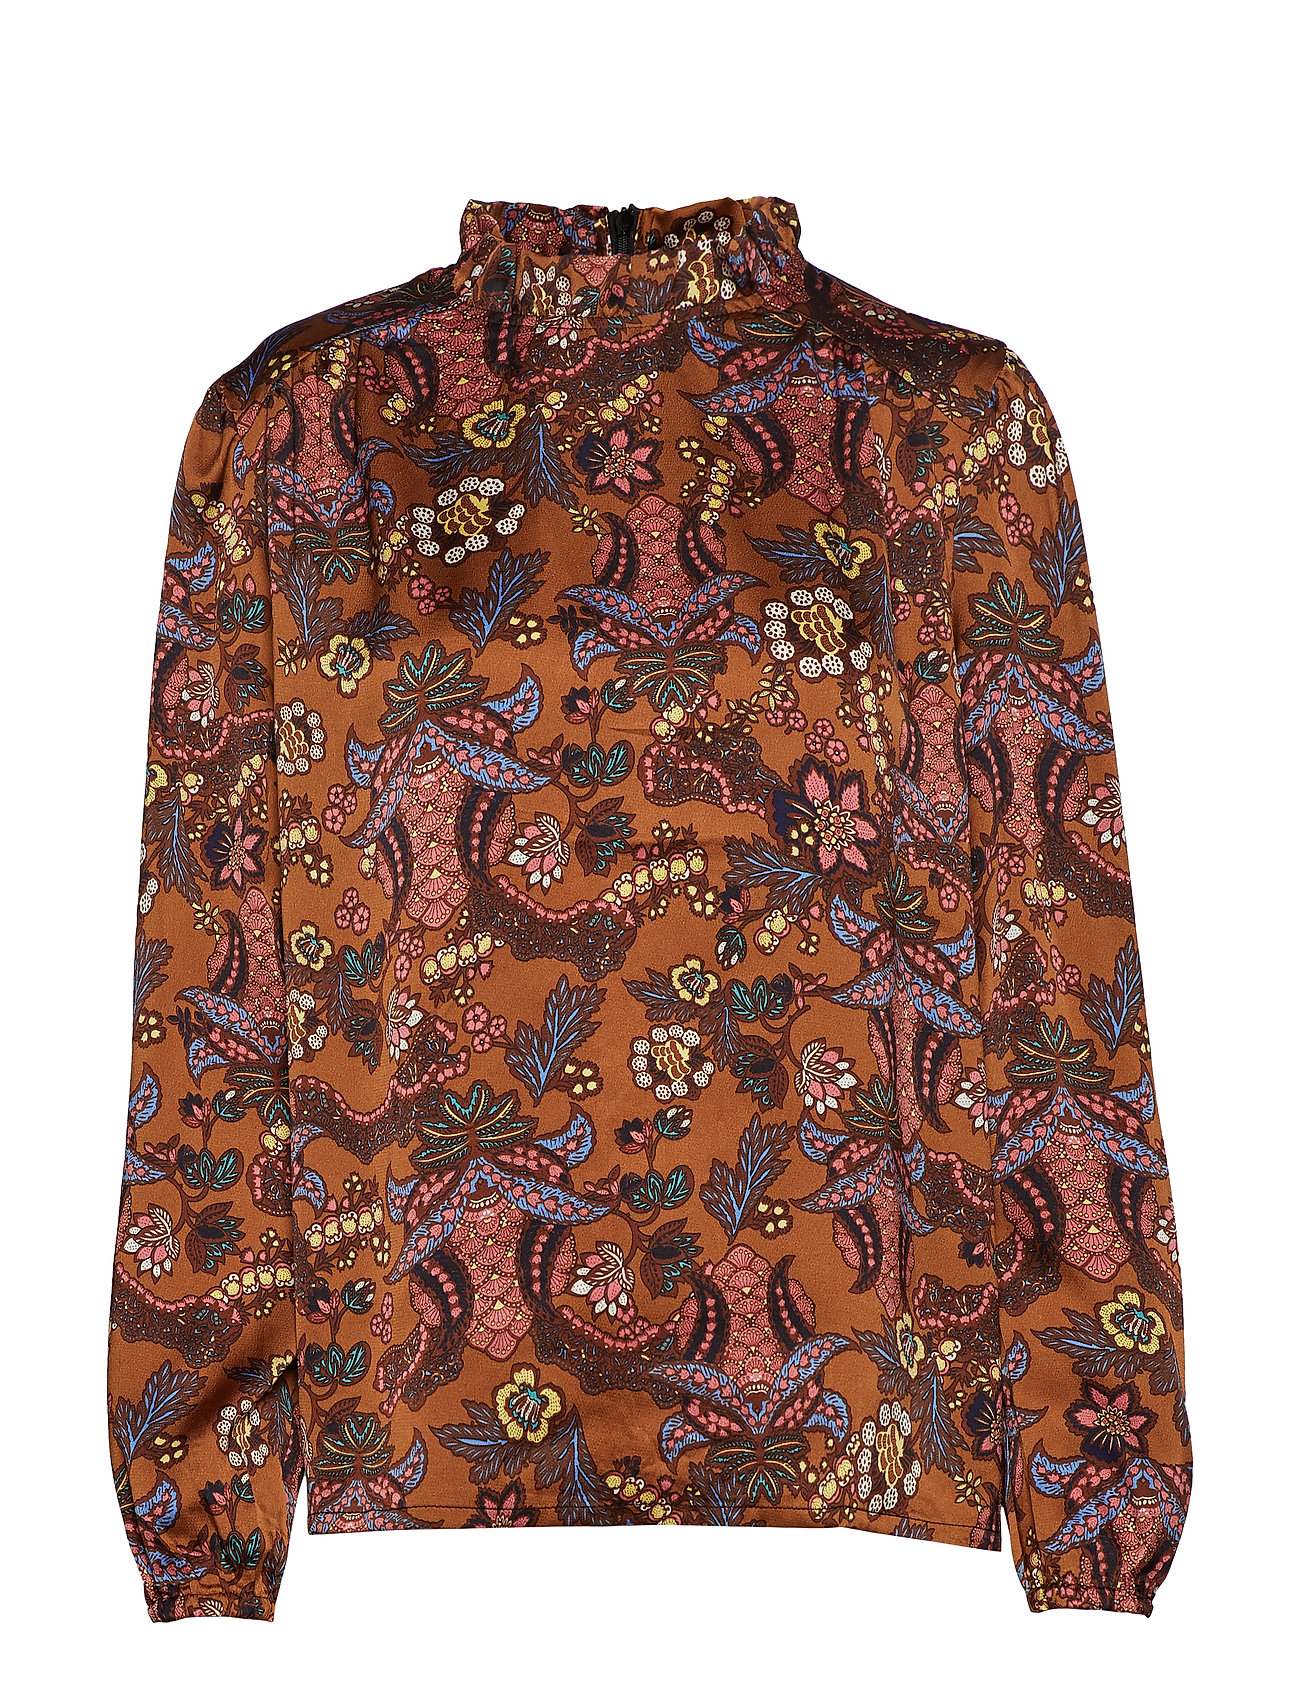 Minus Cardi blouse - AUTUMN BLOOM TOBACCO PRINT